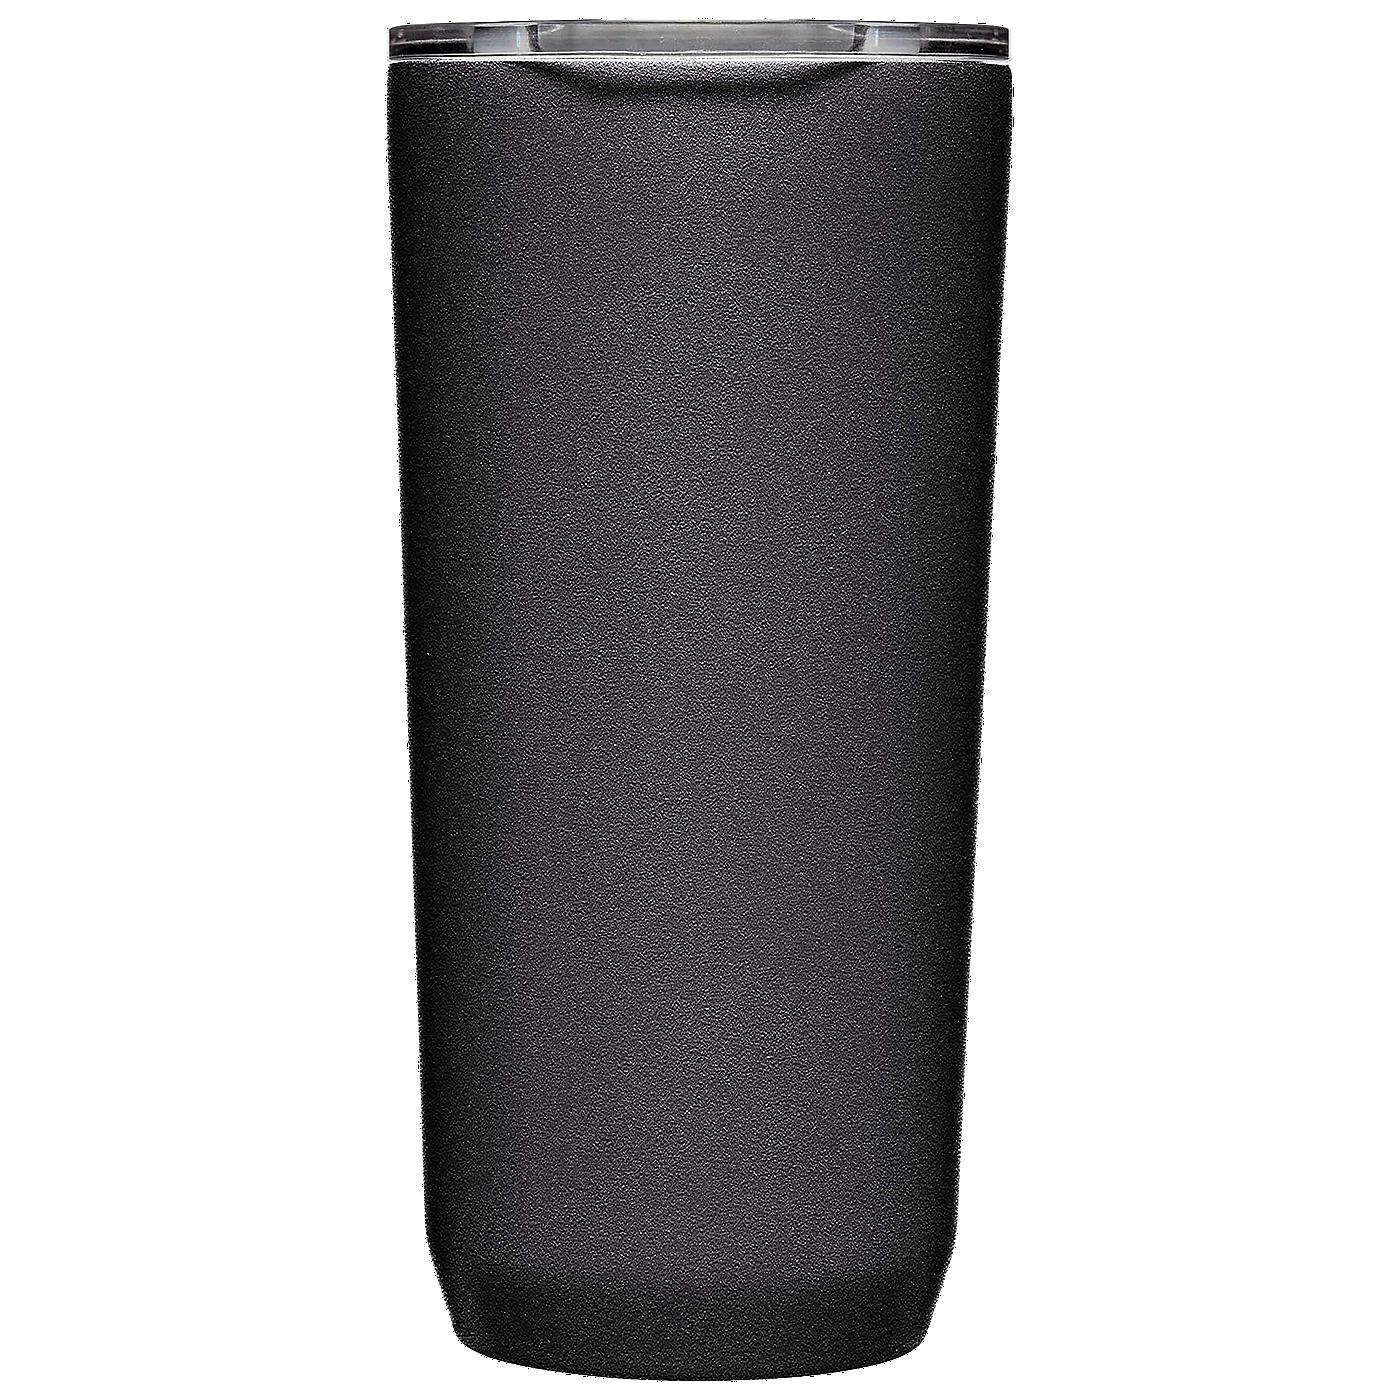 Camelbak Horizon 20 Oz. Vacuum Insulated Tumbler